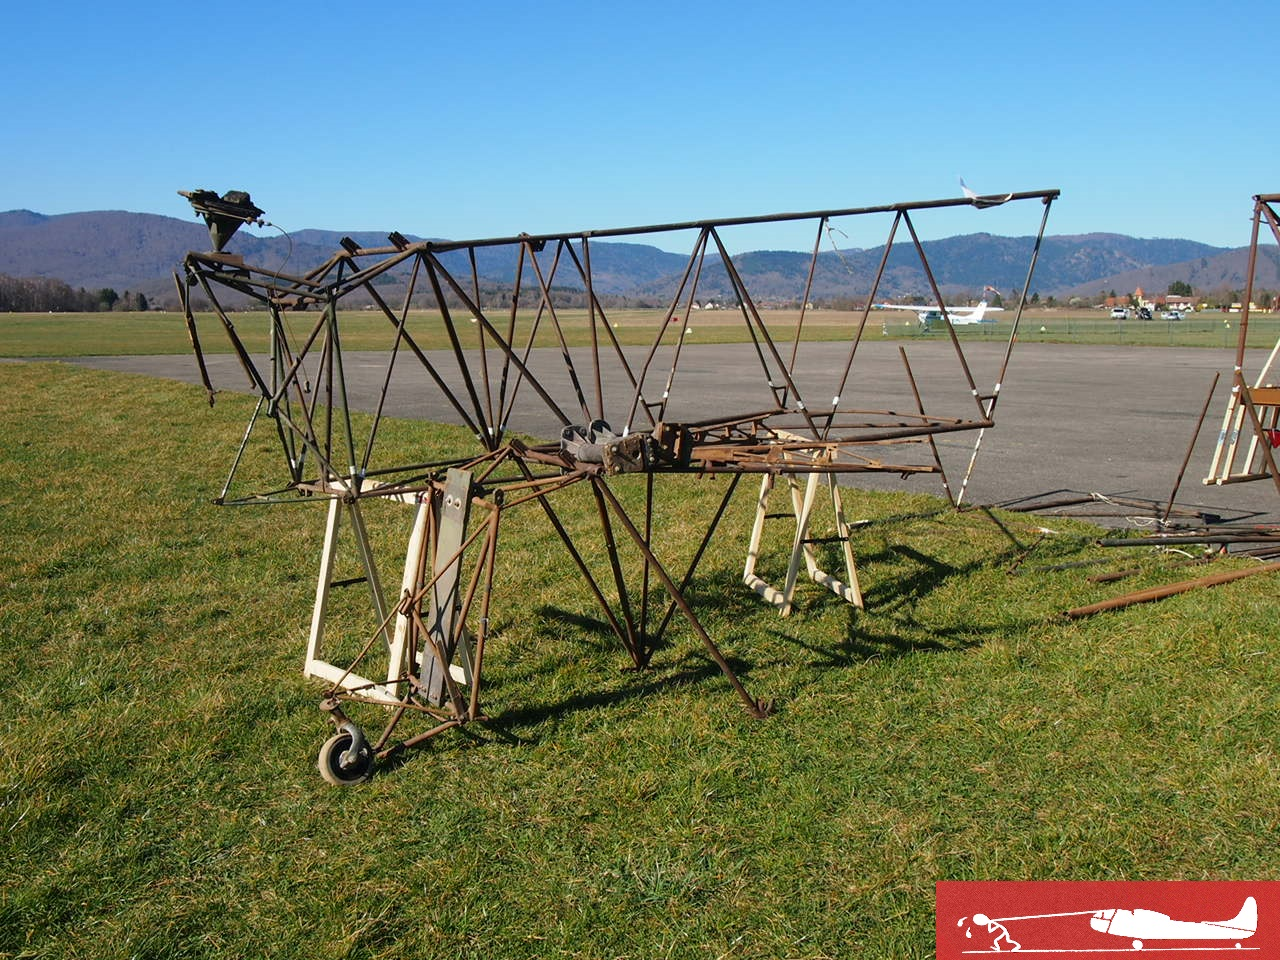 [Gliderborne] Restauration planeur WACO CG-4A P4179724